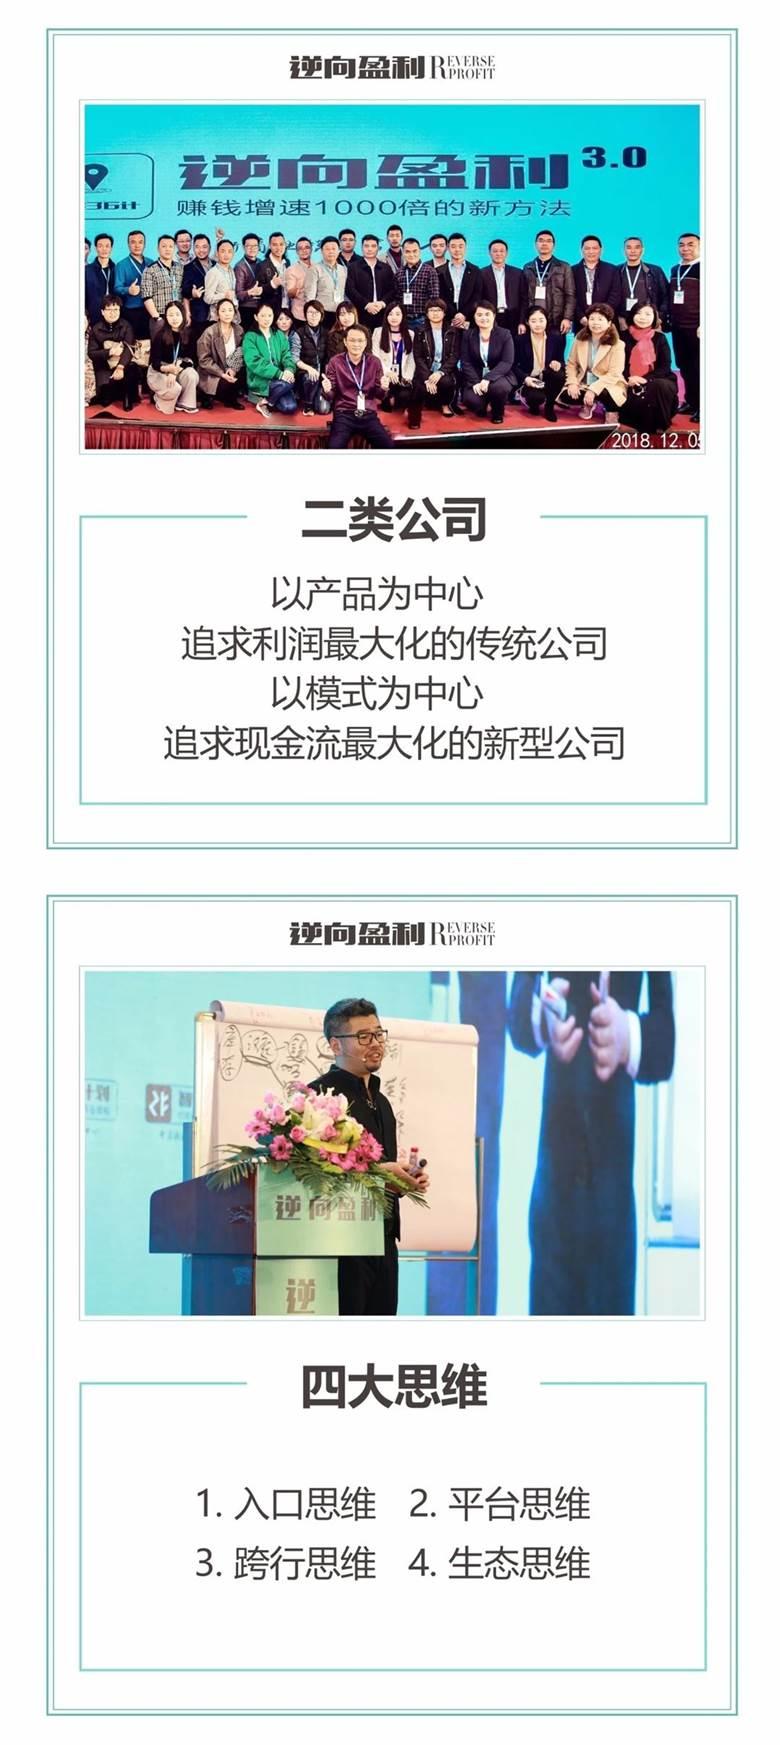 http://www.huodongxing.com/file/20191113/1063603644976/813660716940474.jpg